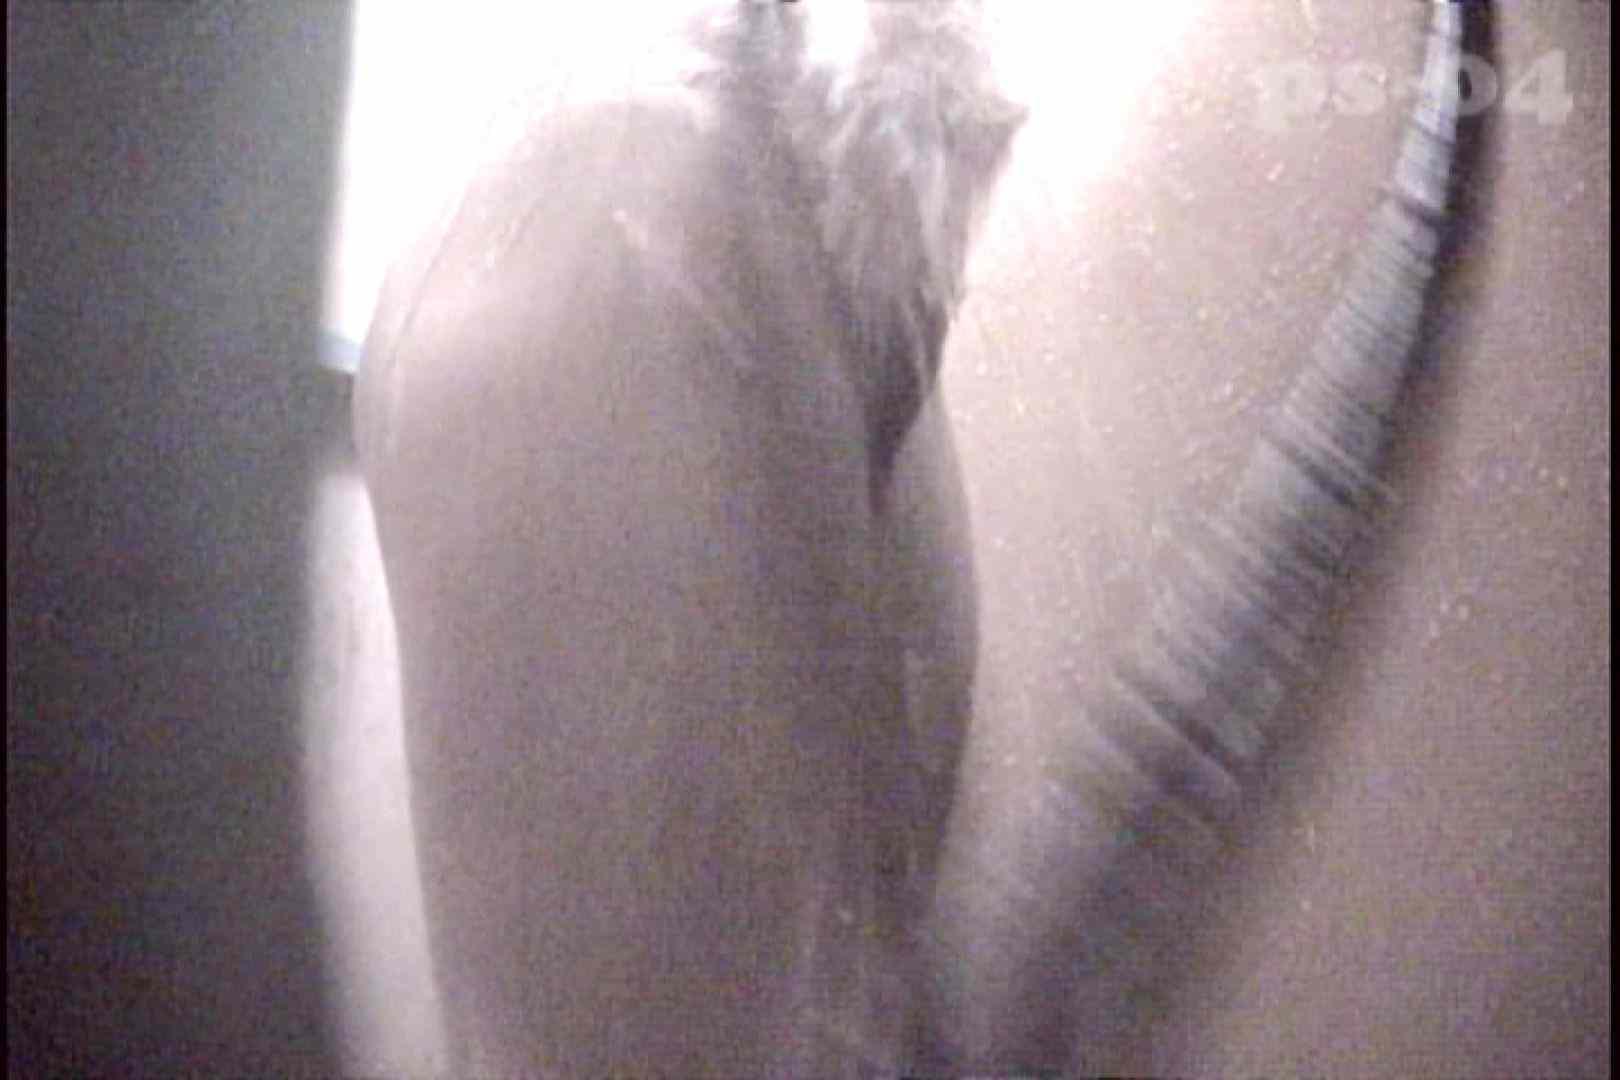 File.28 貧乳好きにはたまりません! 可愛い貧乳 | シャワー中  34連発 1